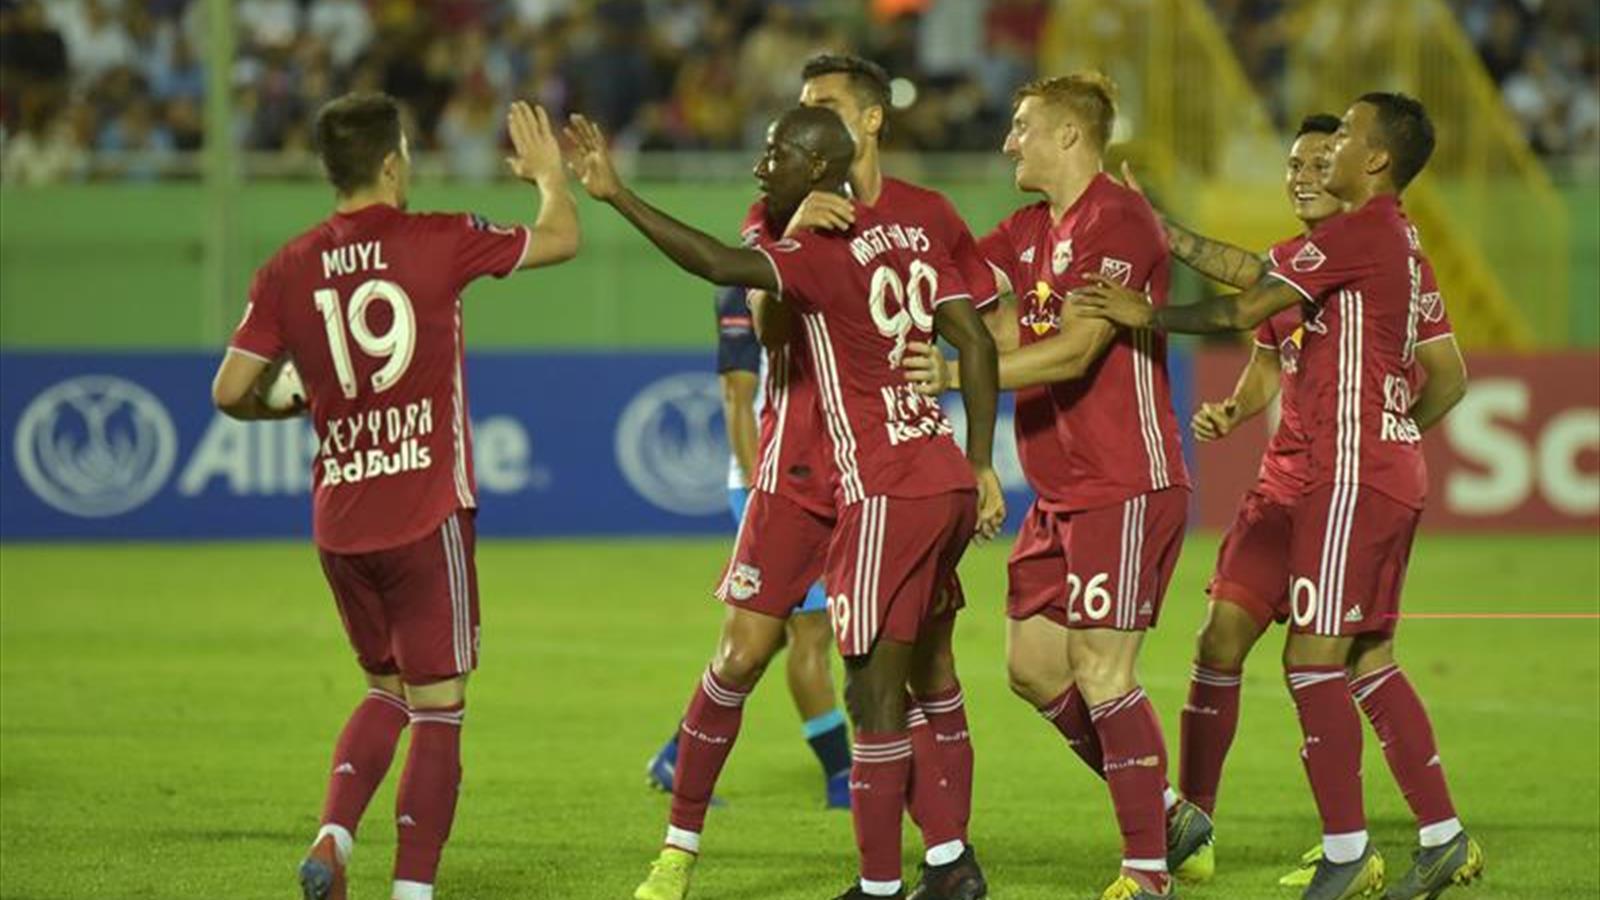 0-2. Los Red Bulls doblegan al Pantoja en la Liga de Campeones de la  Concacaf fdb5d158f8f